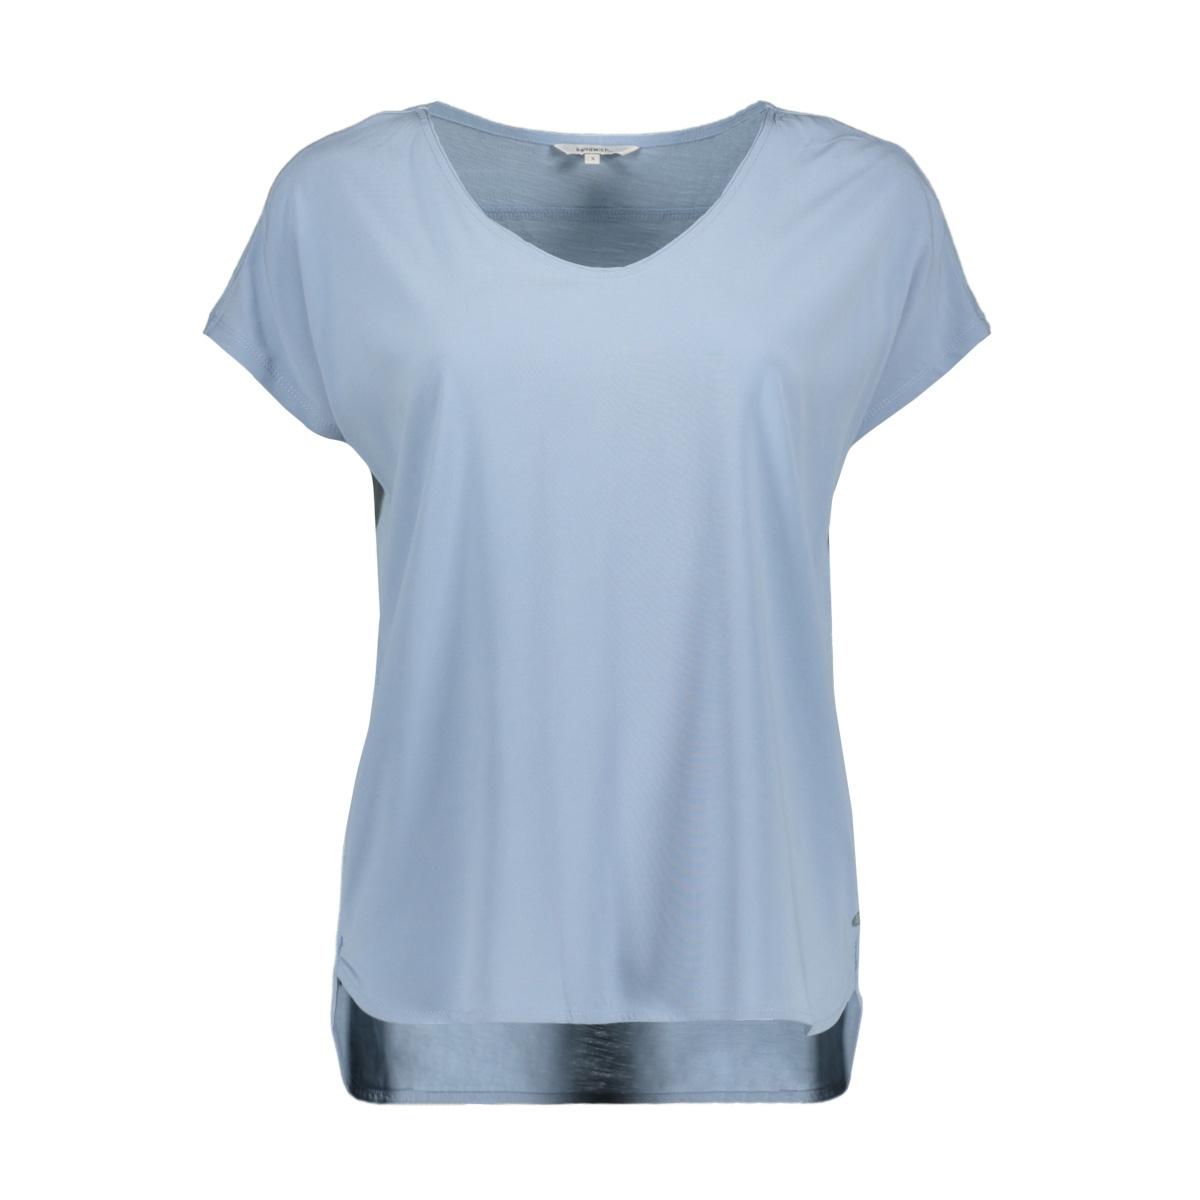 t shirt met aangeknipte mouw 21101847 sandwich t-shirt 41036